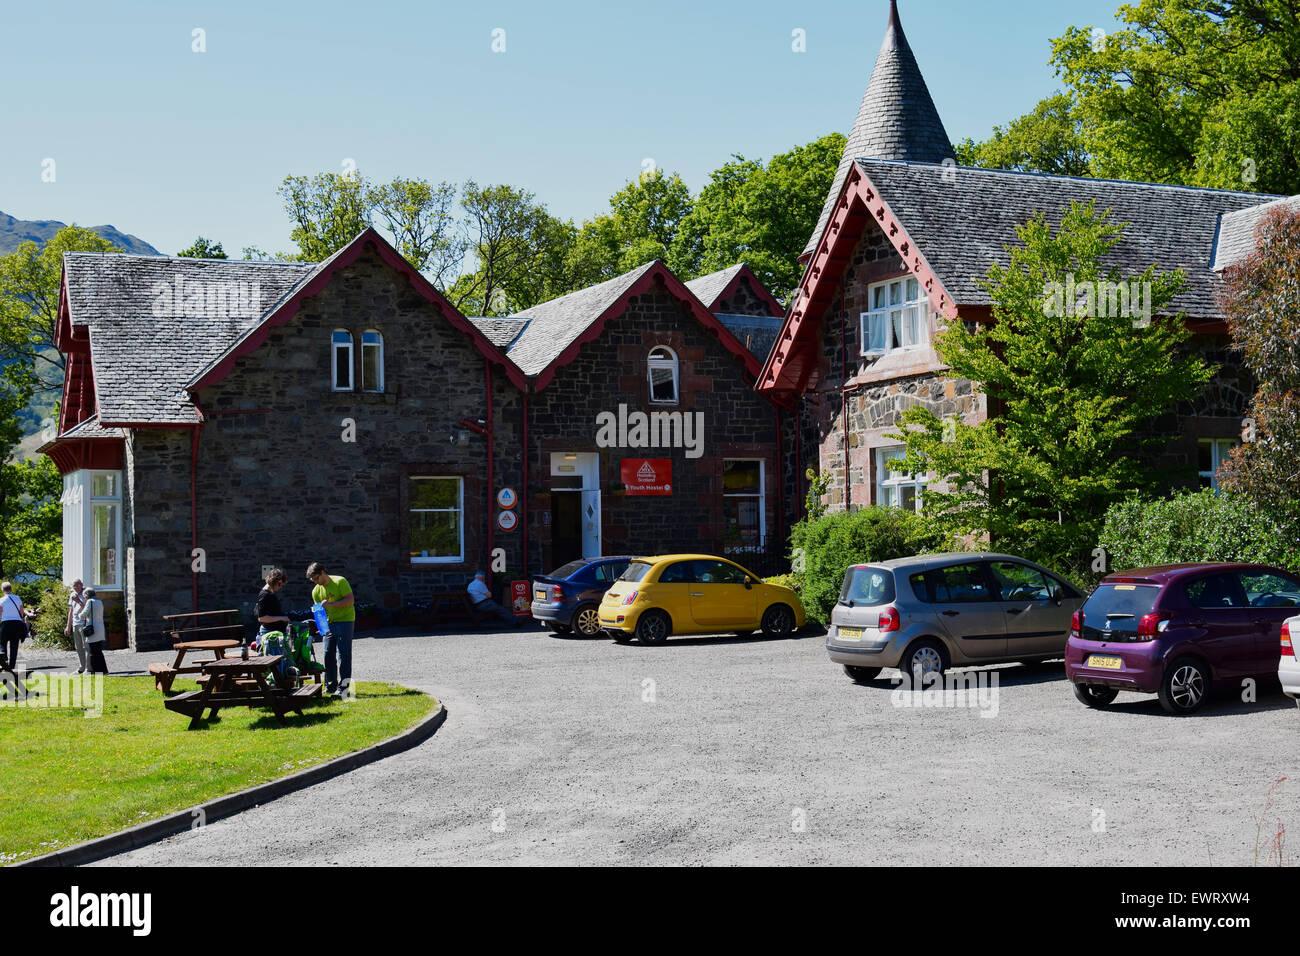 Rowardennan Youth Hostel, on the shore of Loch Lomond, Scottish Highlands. Stock Photo